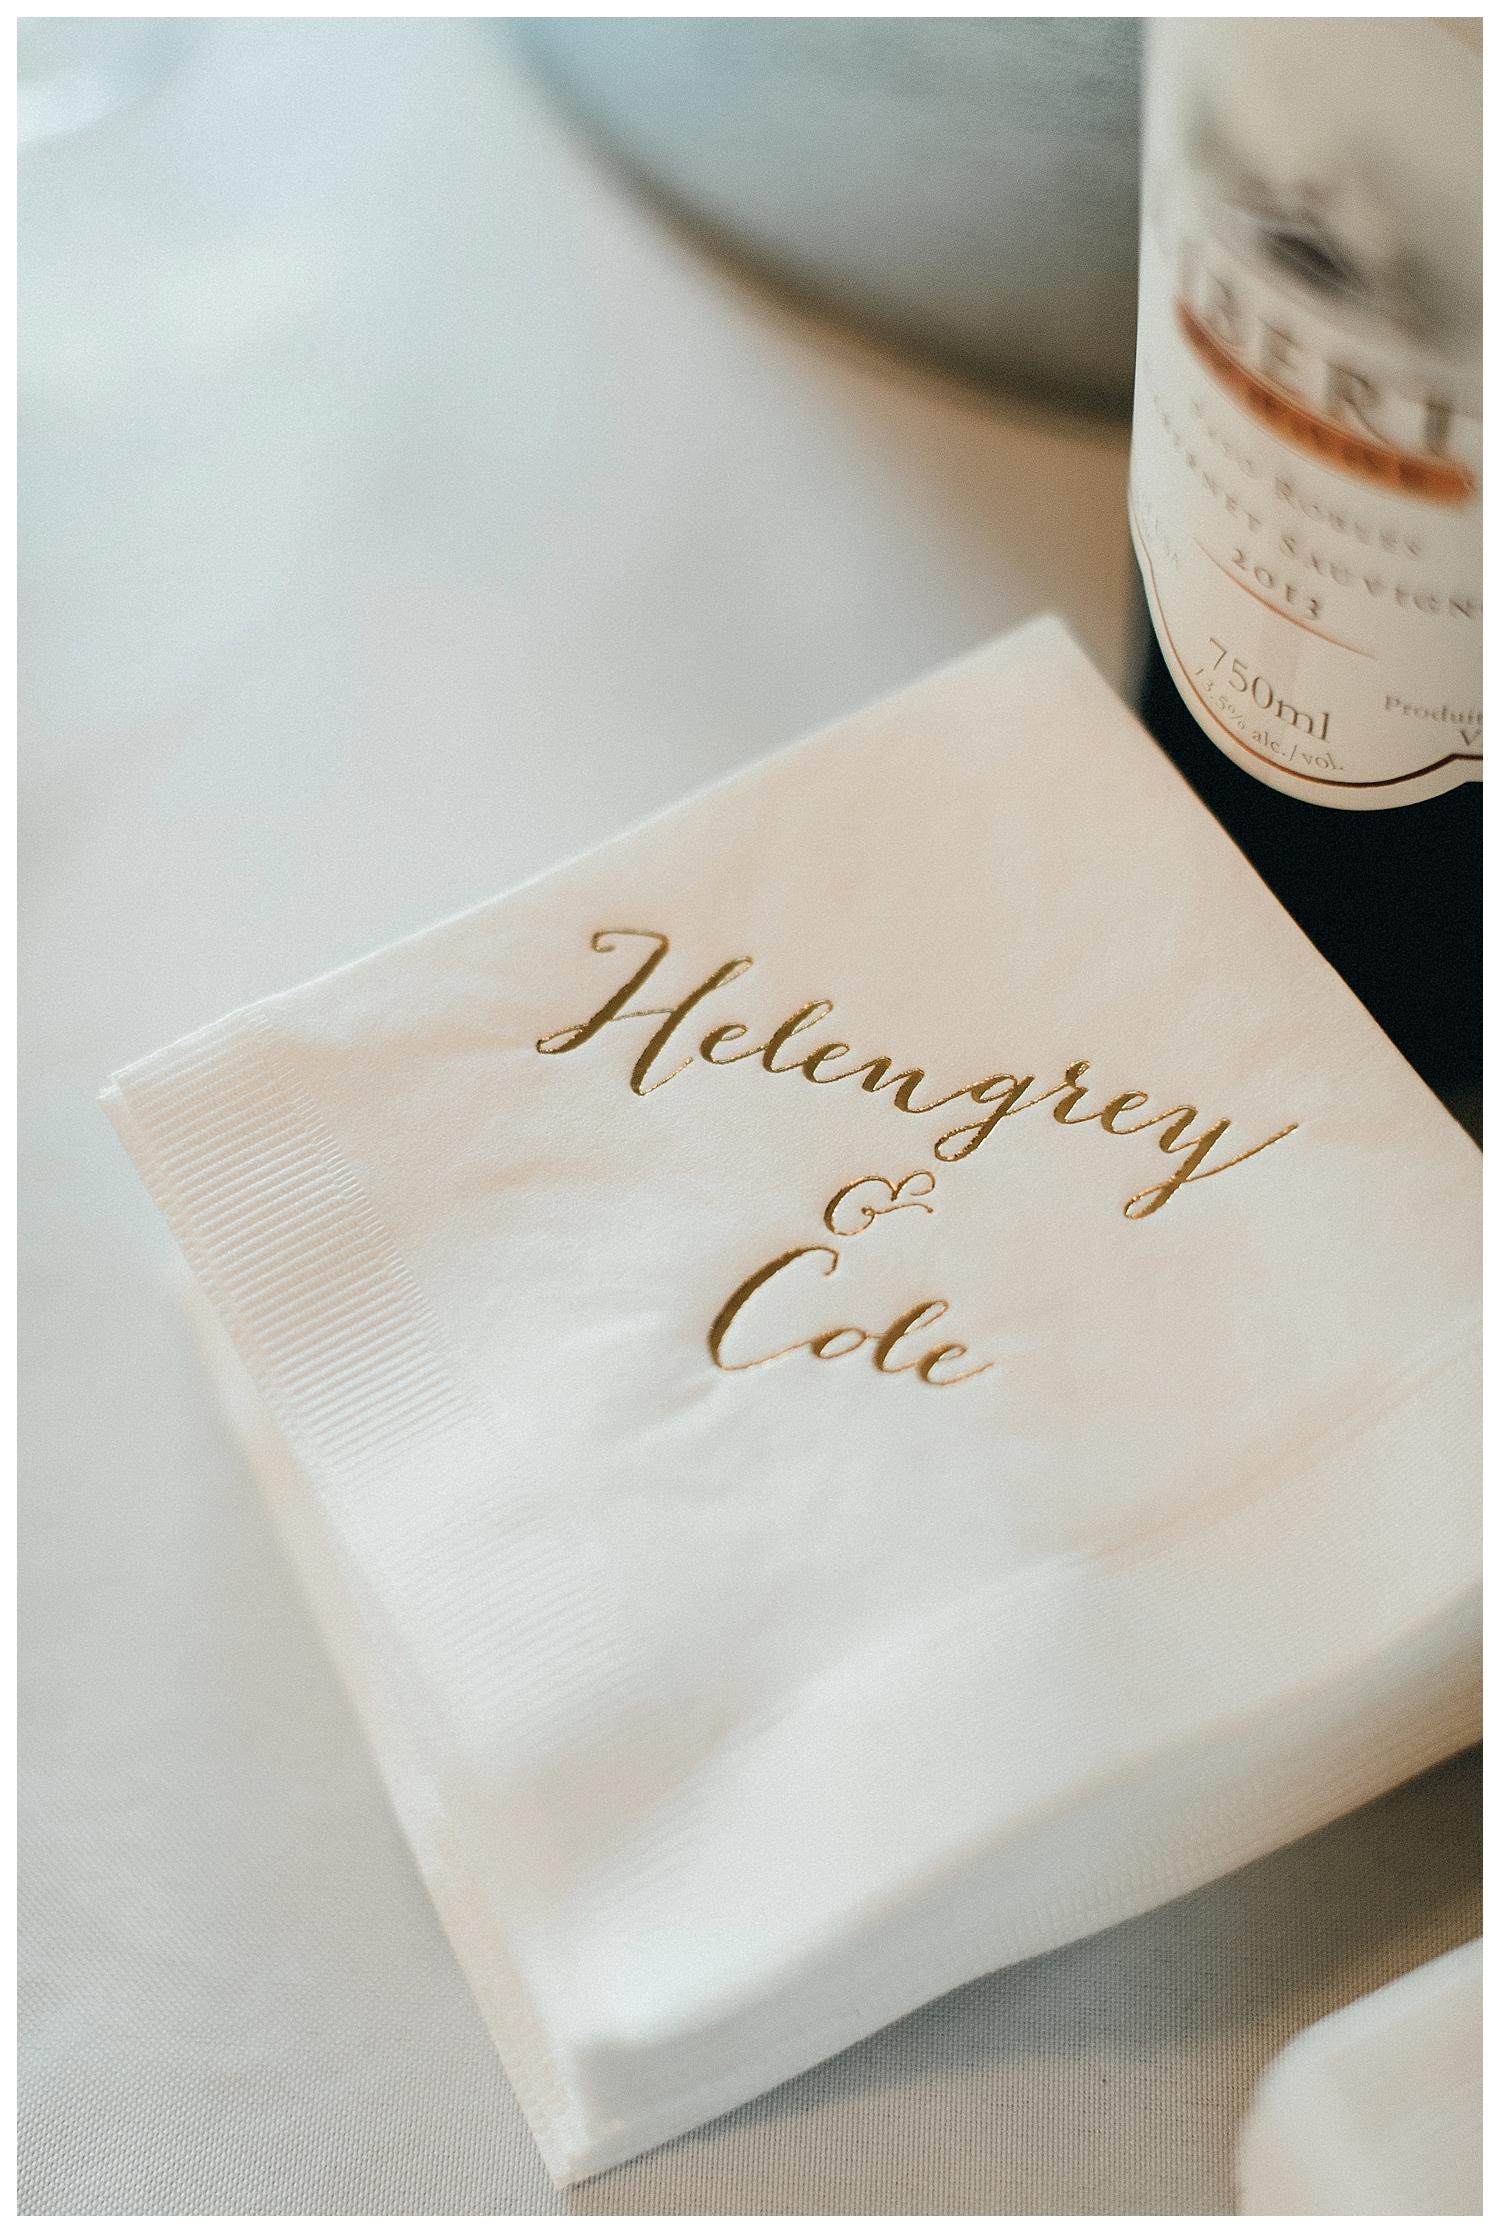 helengrey+cole1164.jpg